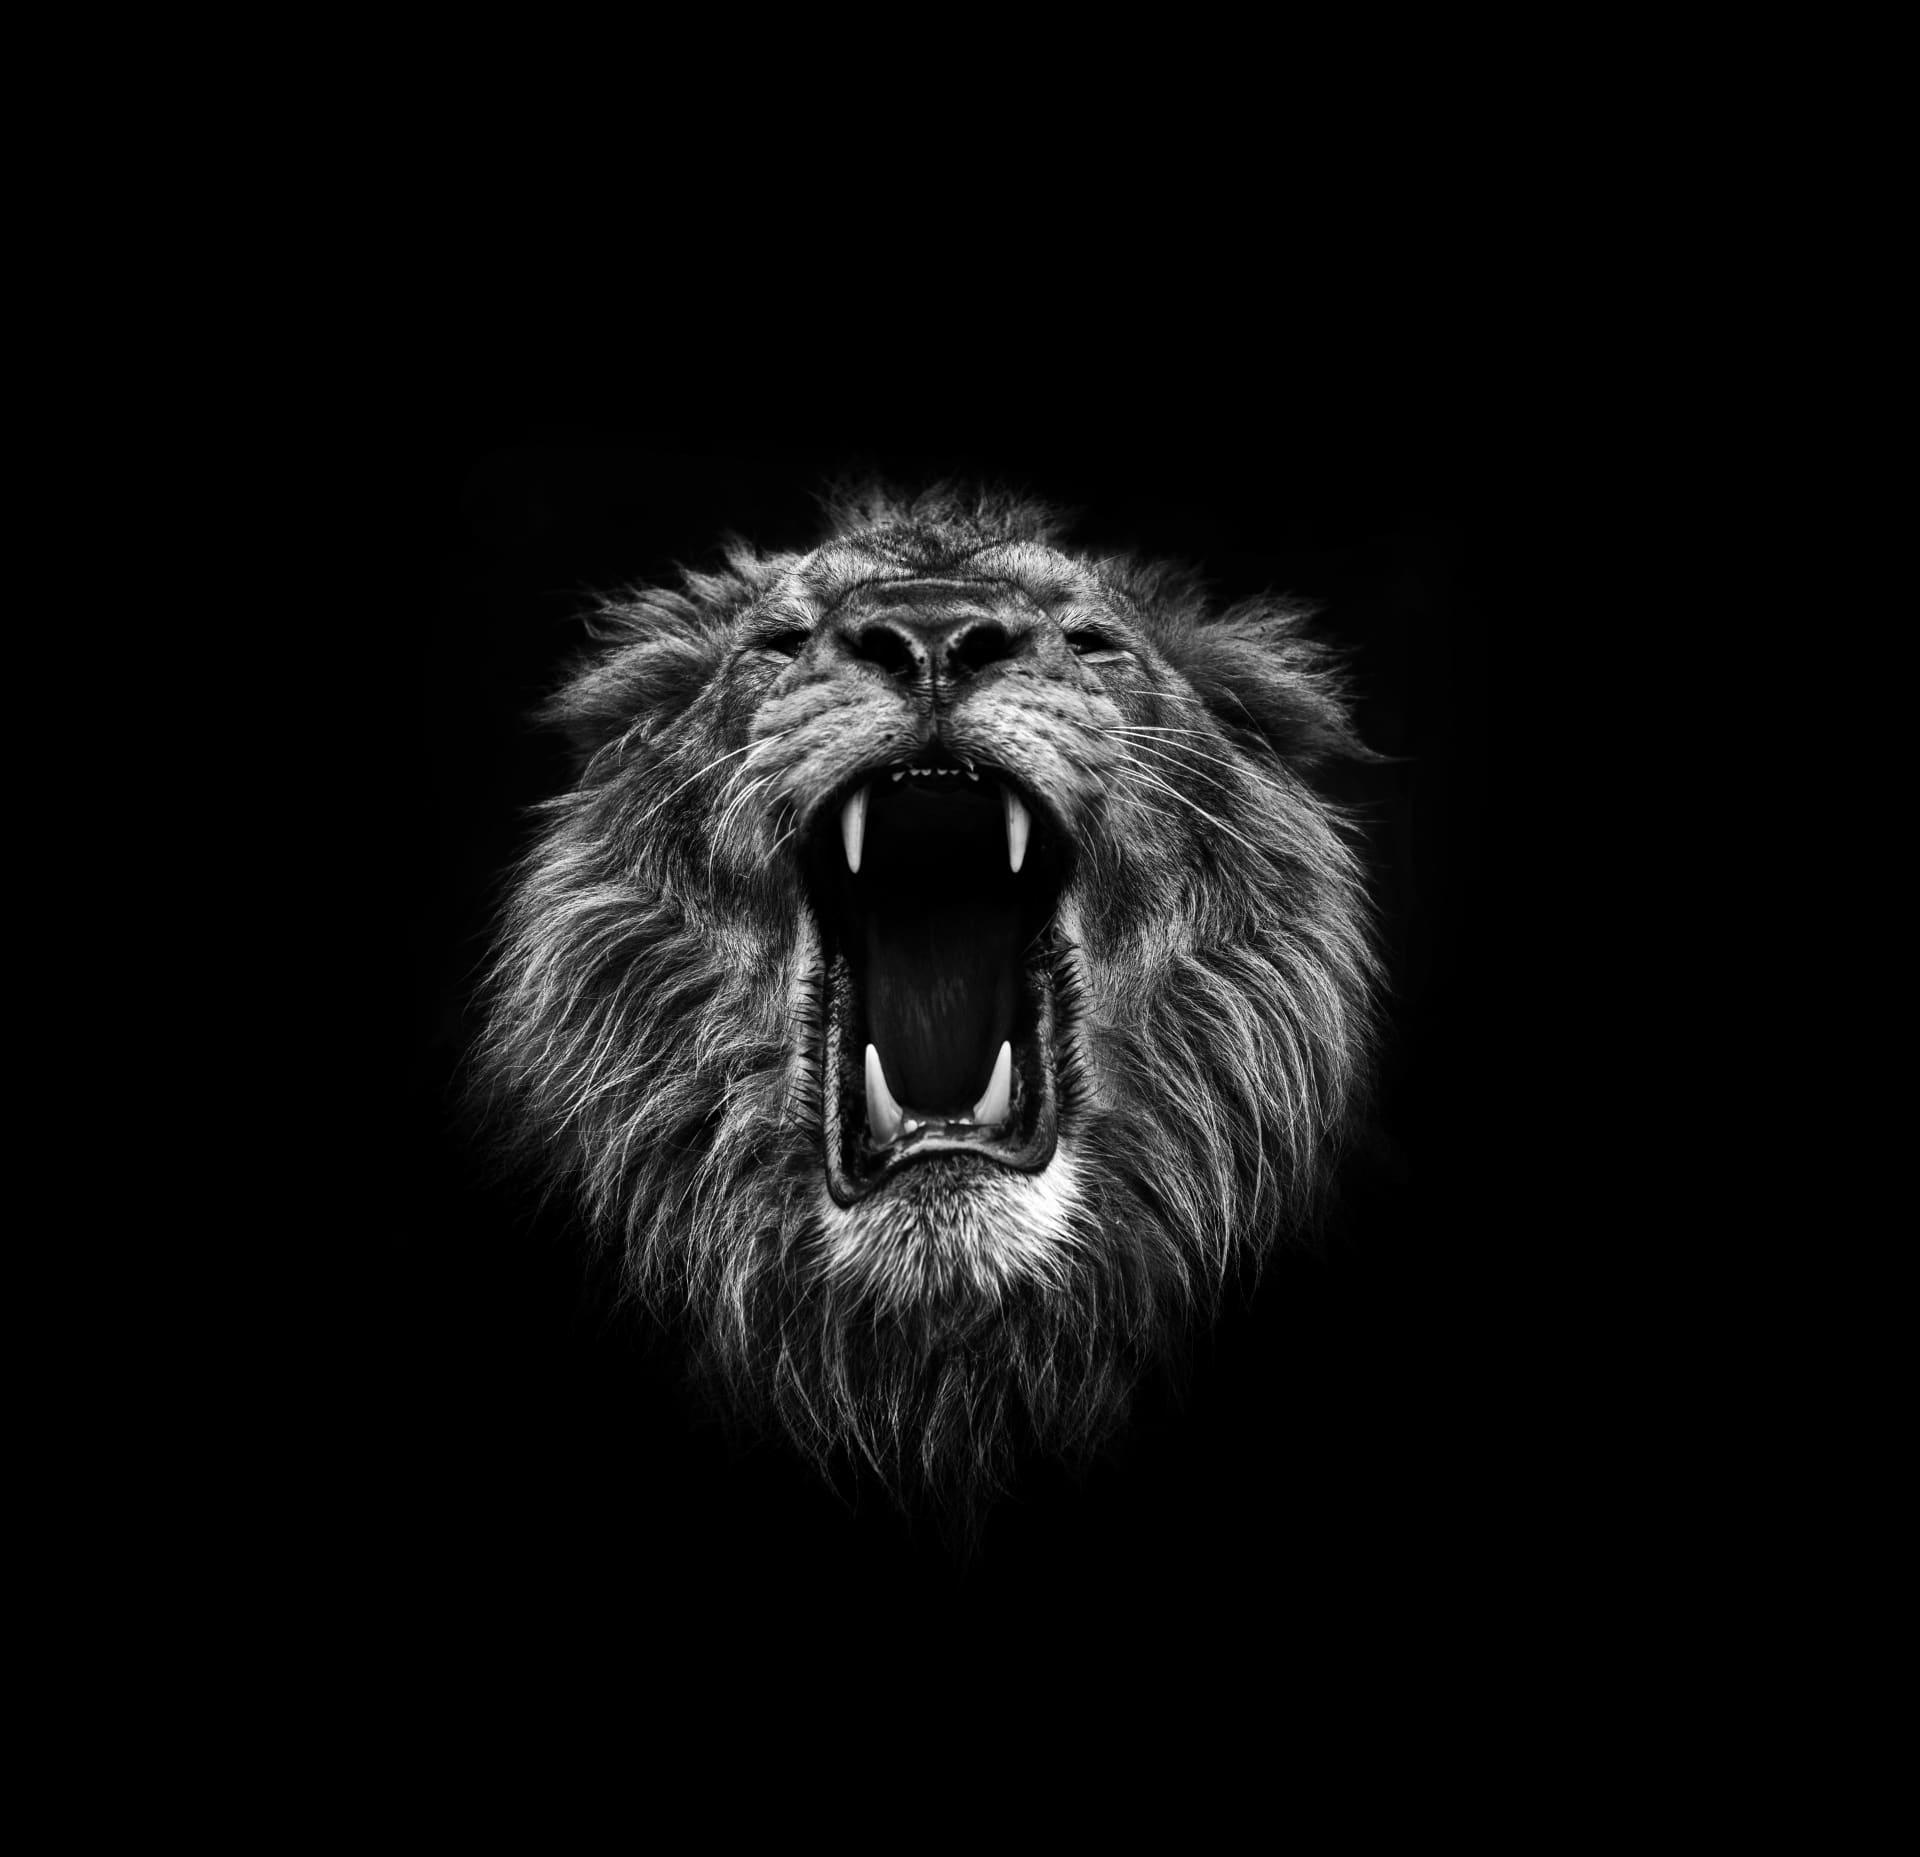 LONDON ZOO LION V03 1